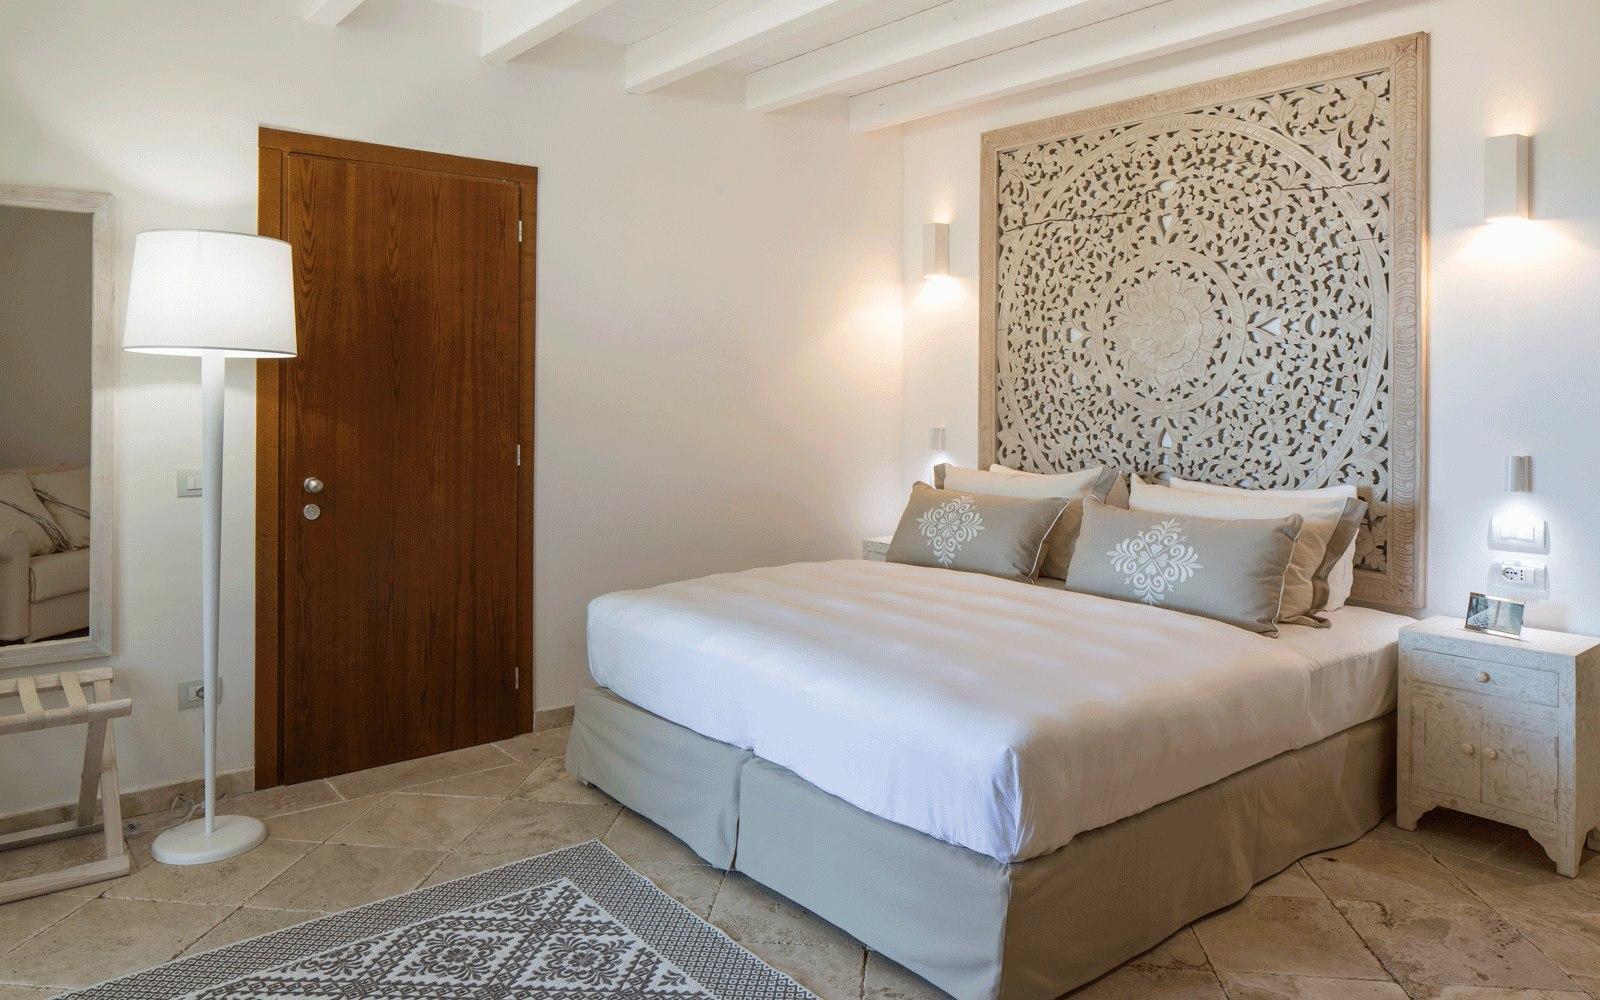 Two Bedroom Villa at Capo Boi Resort